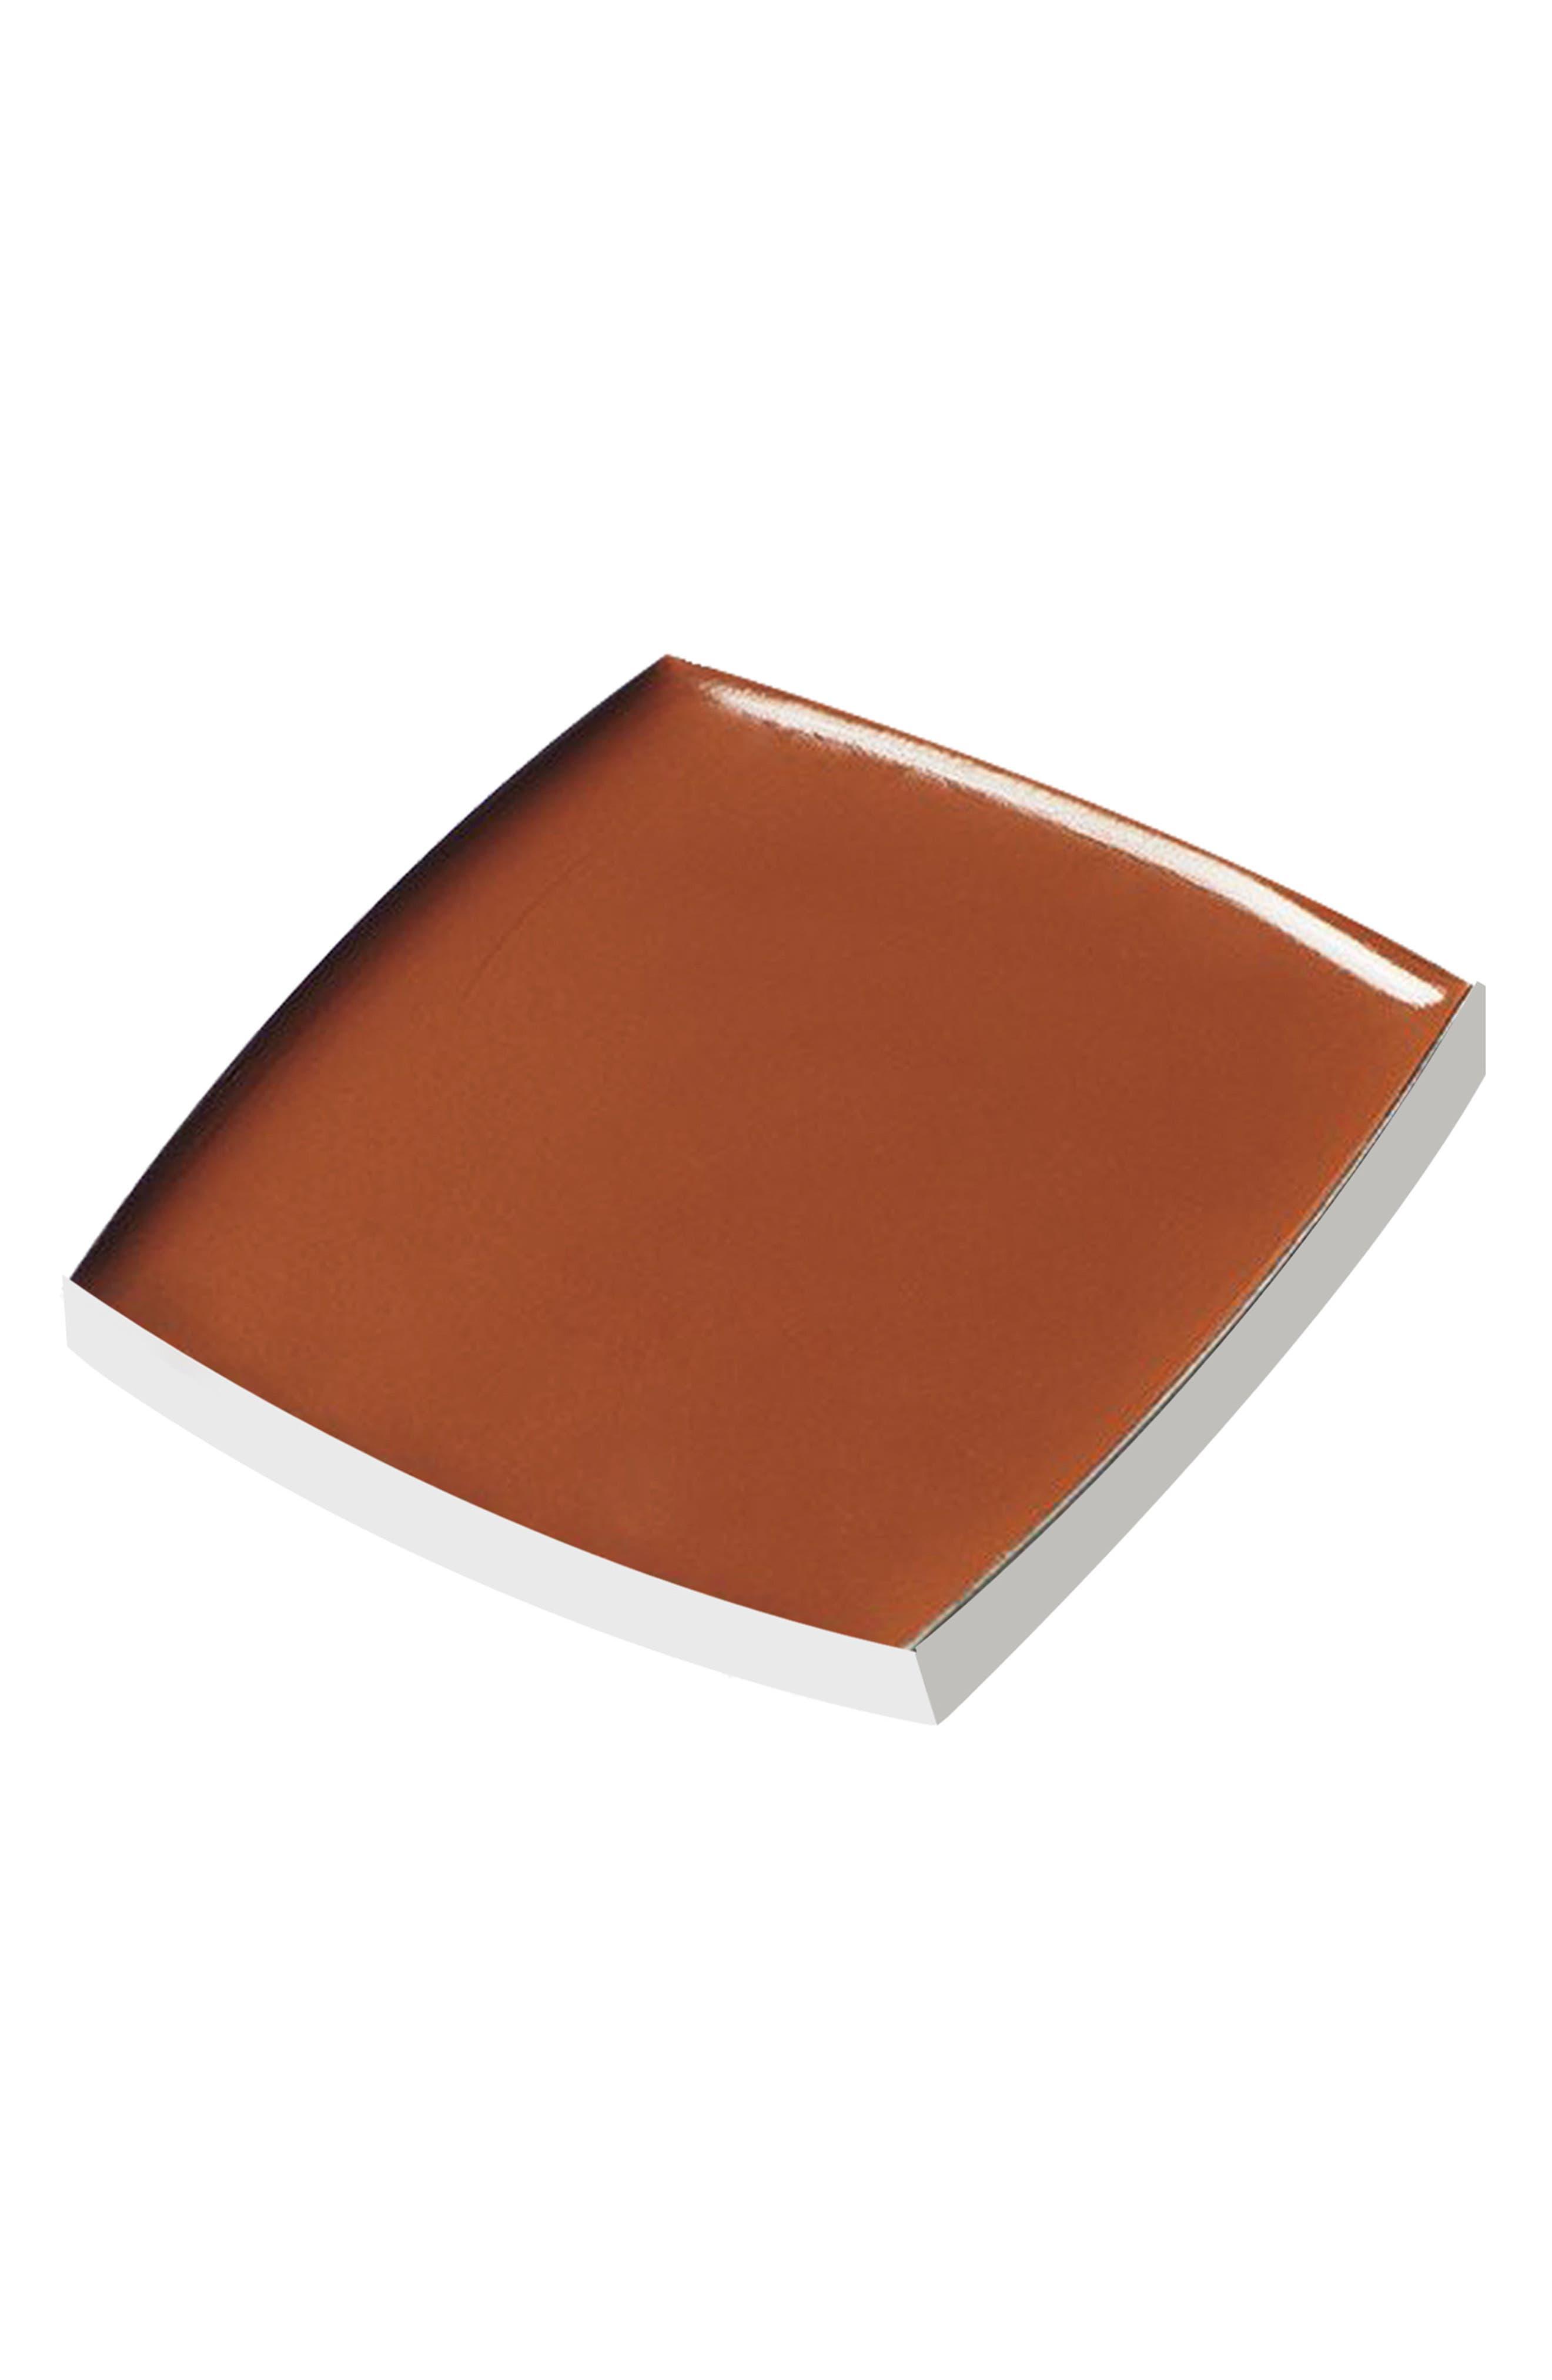 Artist Kit Refill Pan